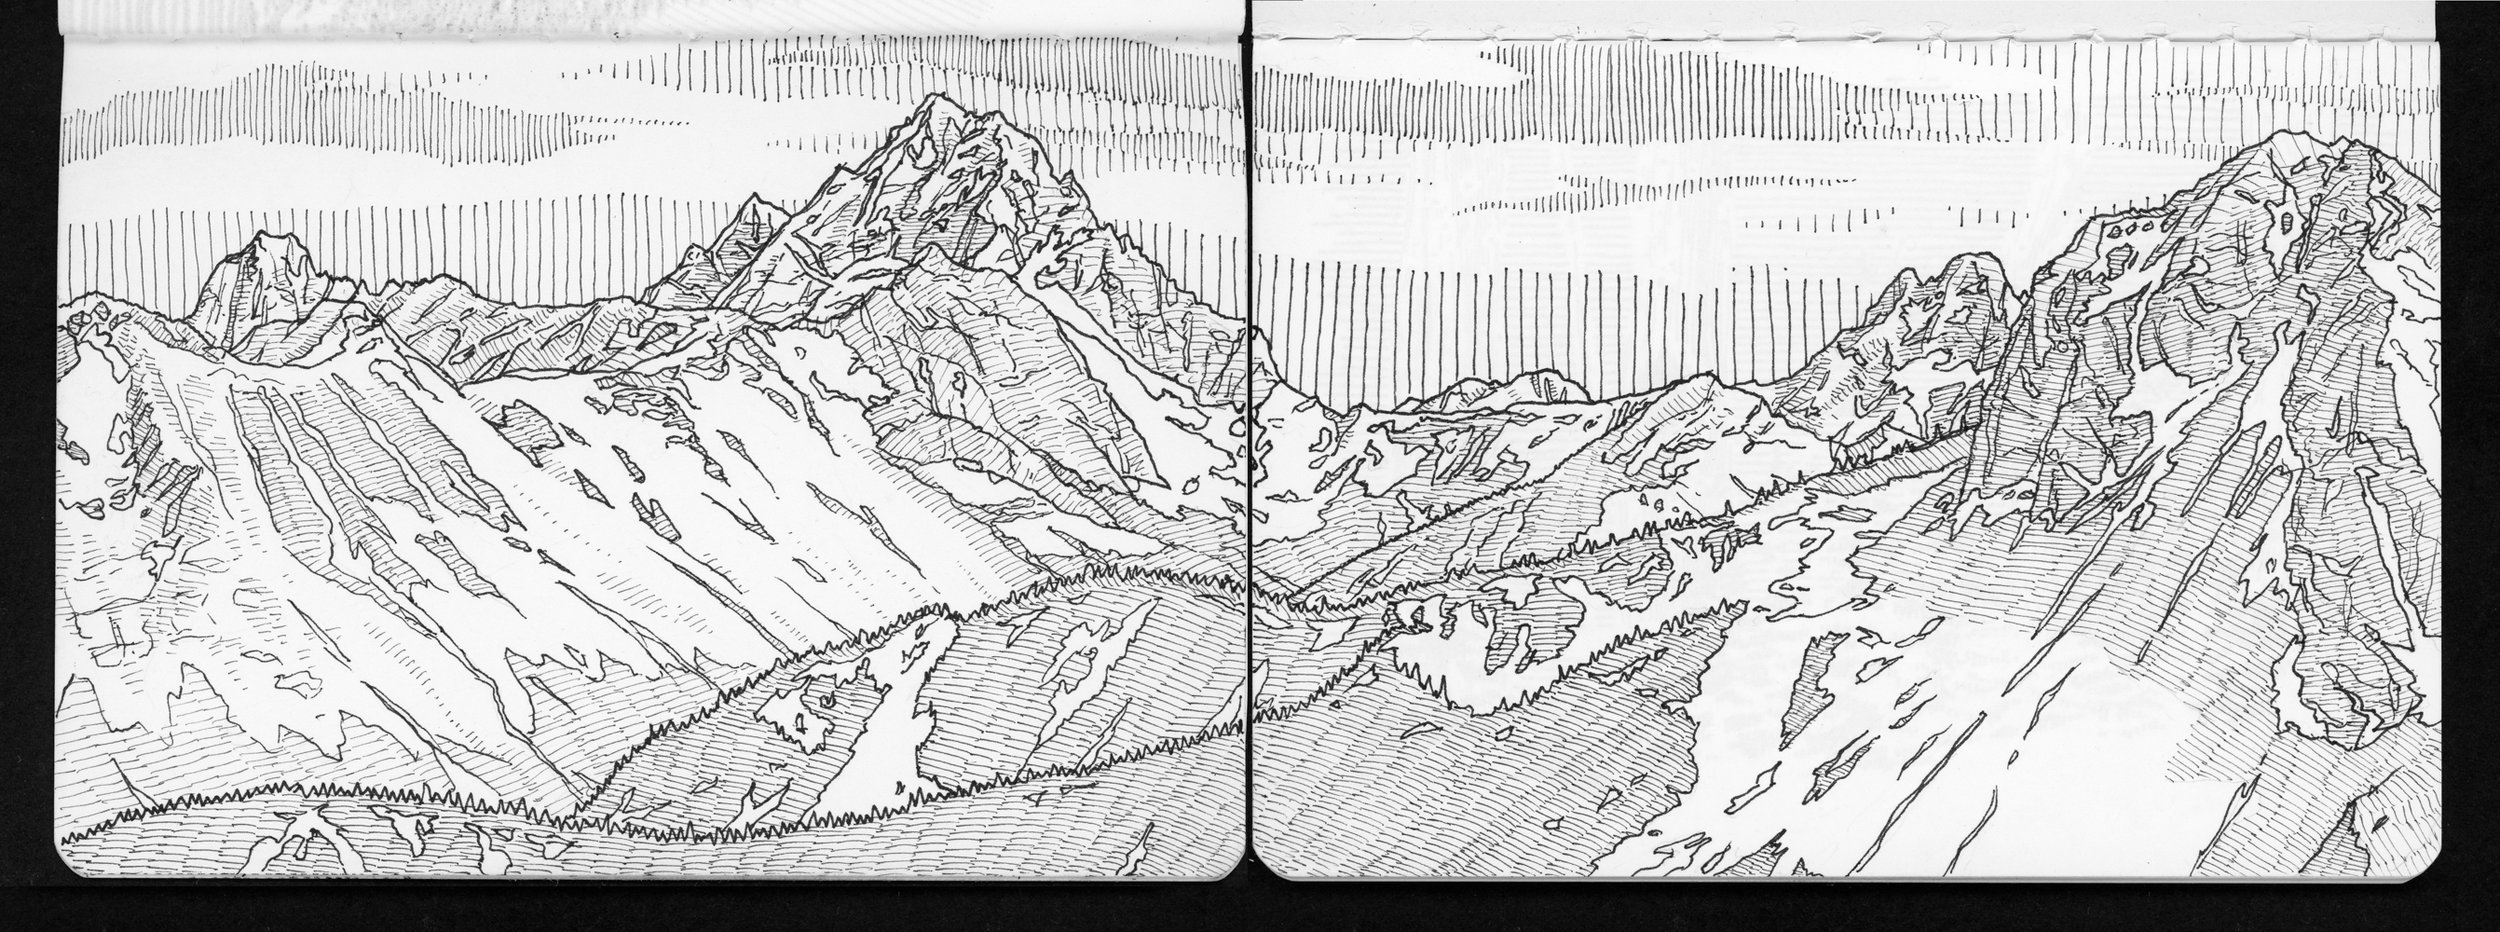 05-23 Stuart and Harding Mountain over Jack Creek Valley Pano.jpg